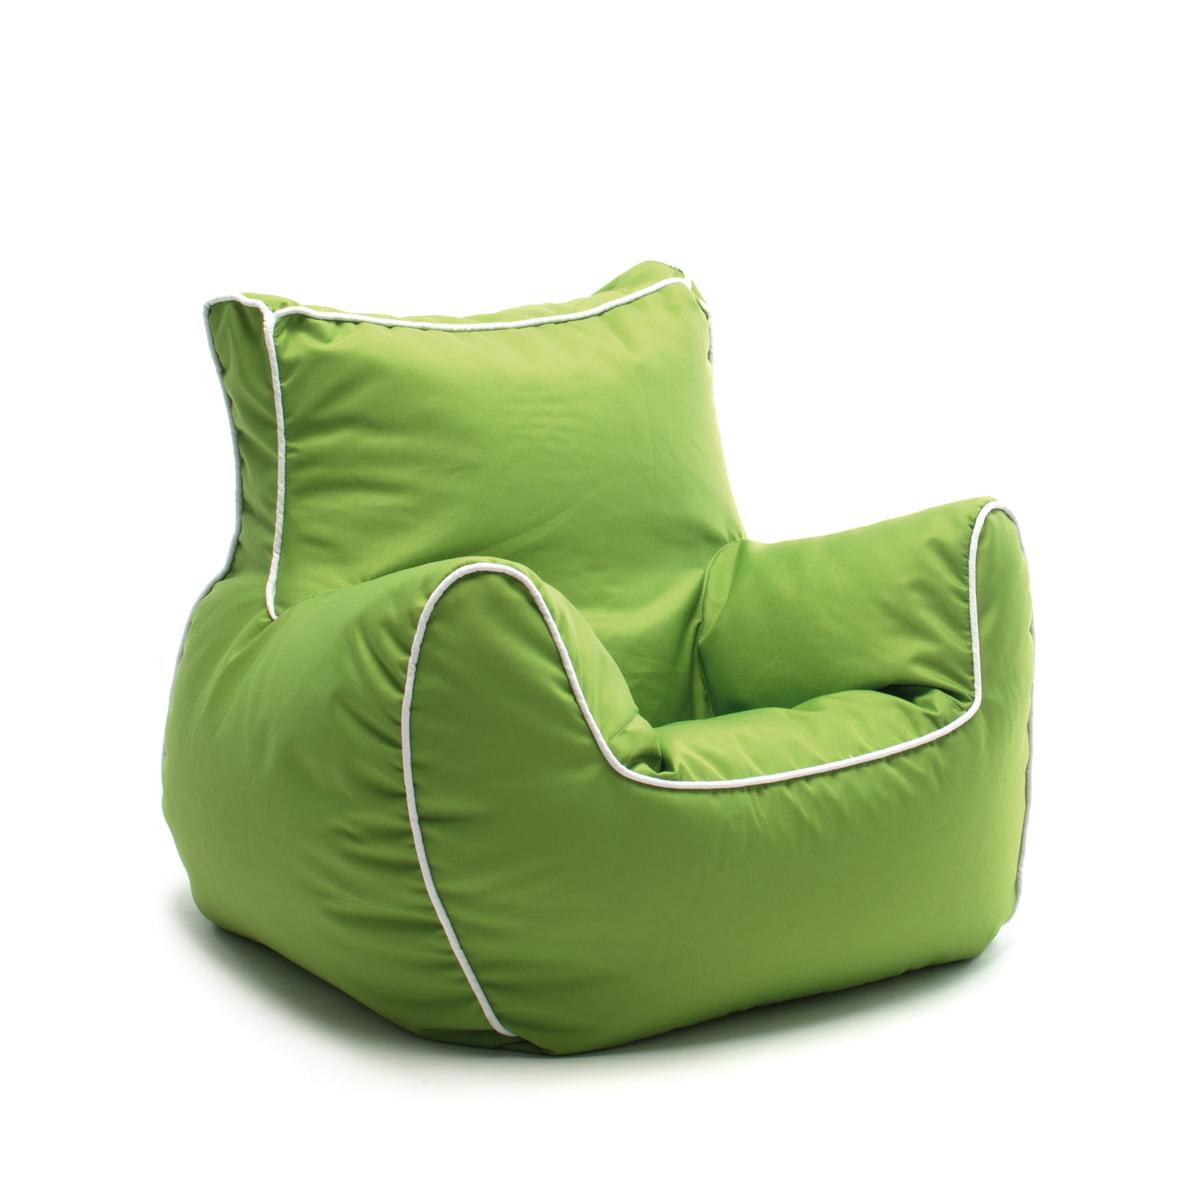 pouf enfant bamp de sitting bull connox. Black Bedroom Furniture Sets. Home Design Ideas